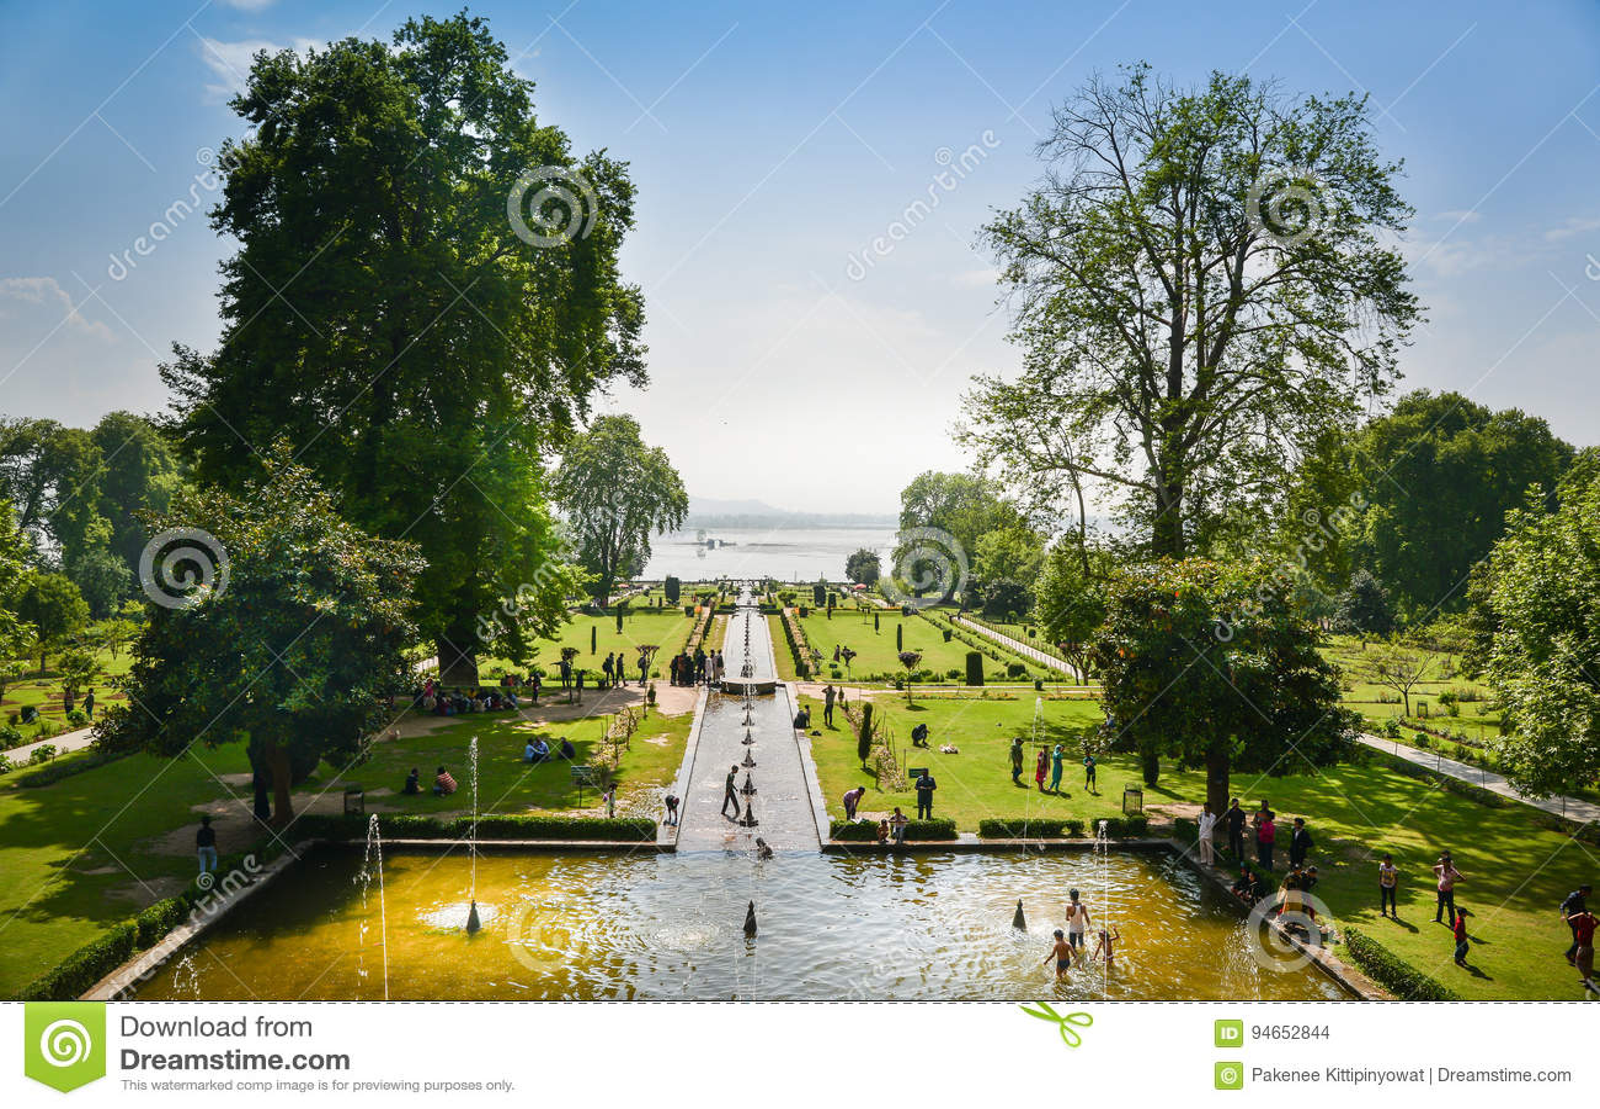 NISHAT BAGH, SRINAGAR, KASHMIR, INDIA-MAY, 2017: People enjoy summer in Nishat Bagh garden